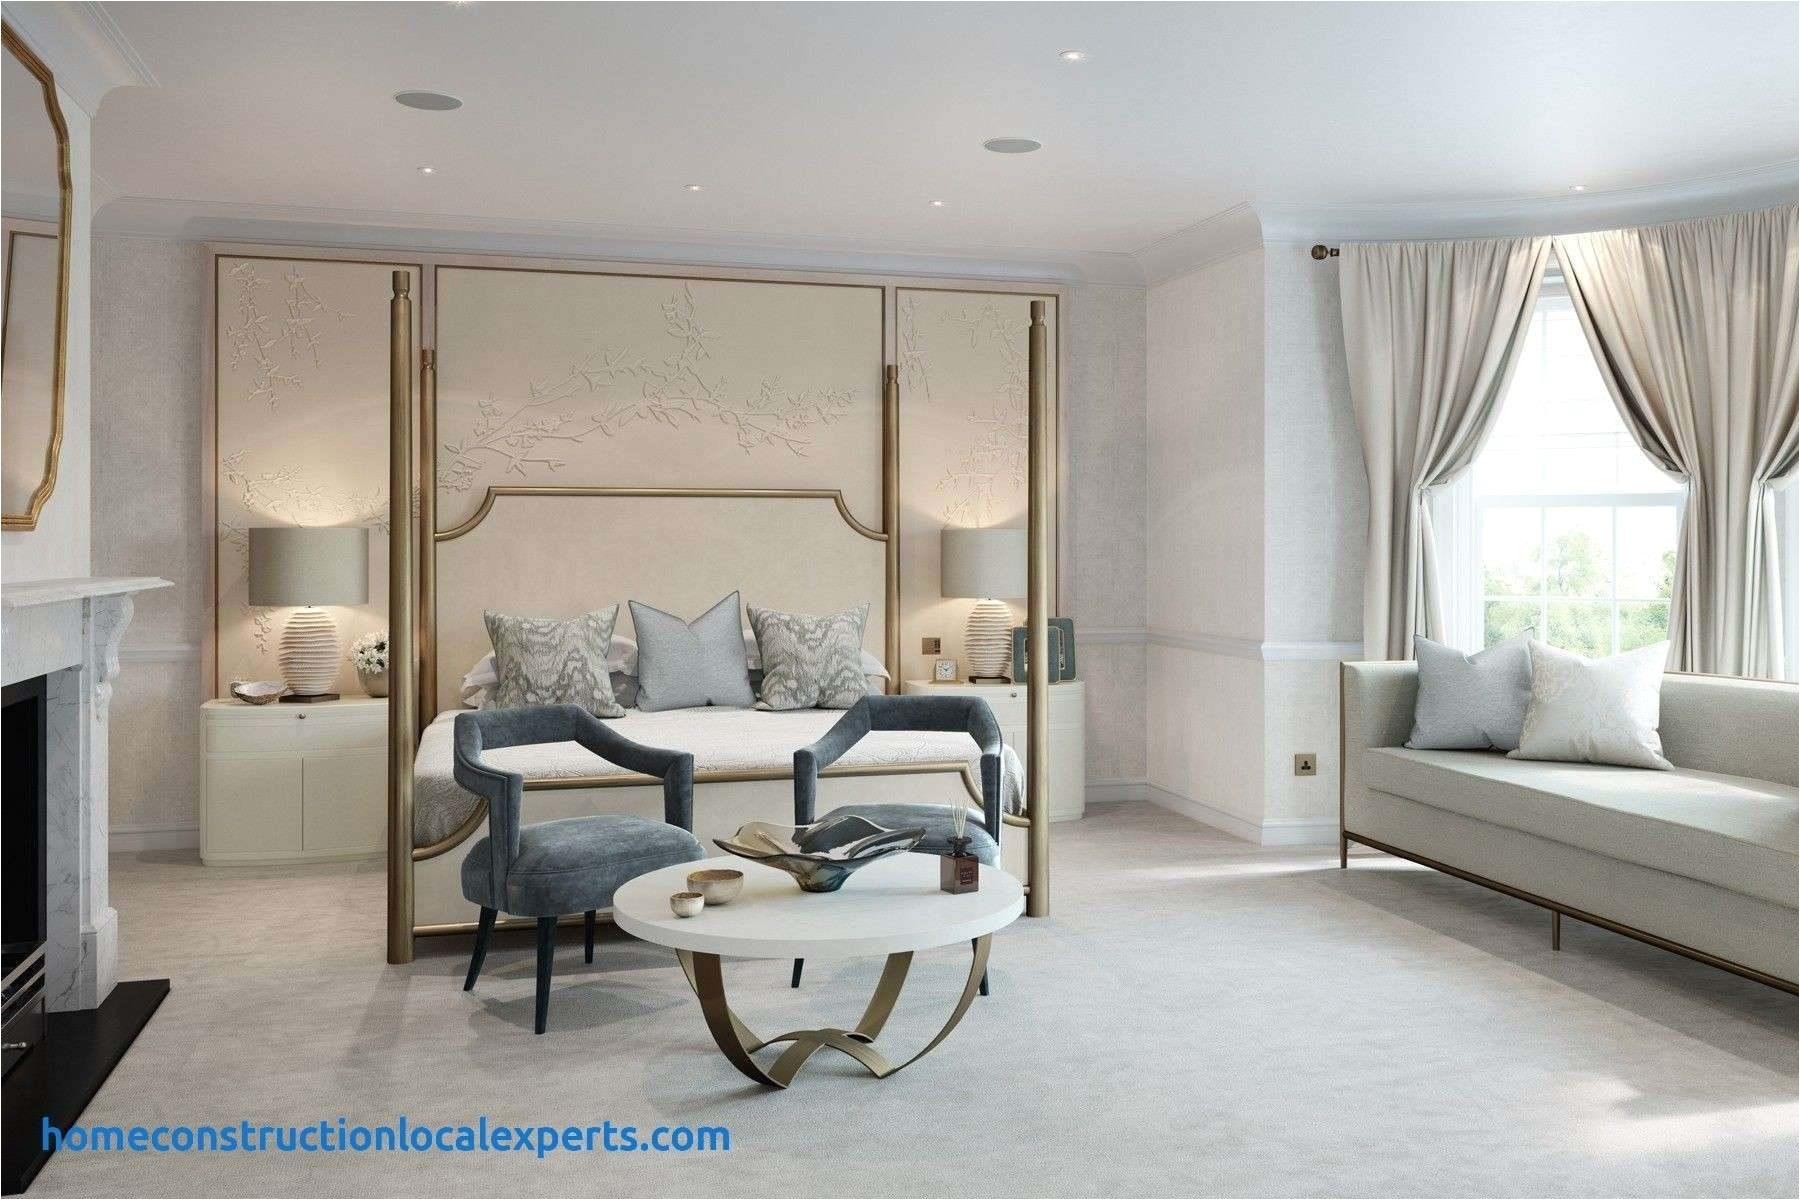 1 Bedroom Apartments for Rent In Savannah Ga 26 1 Bedroom Apartments for Rent Nyc Cool 36 Amazing Nyc Apartment